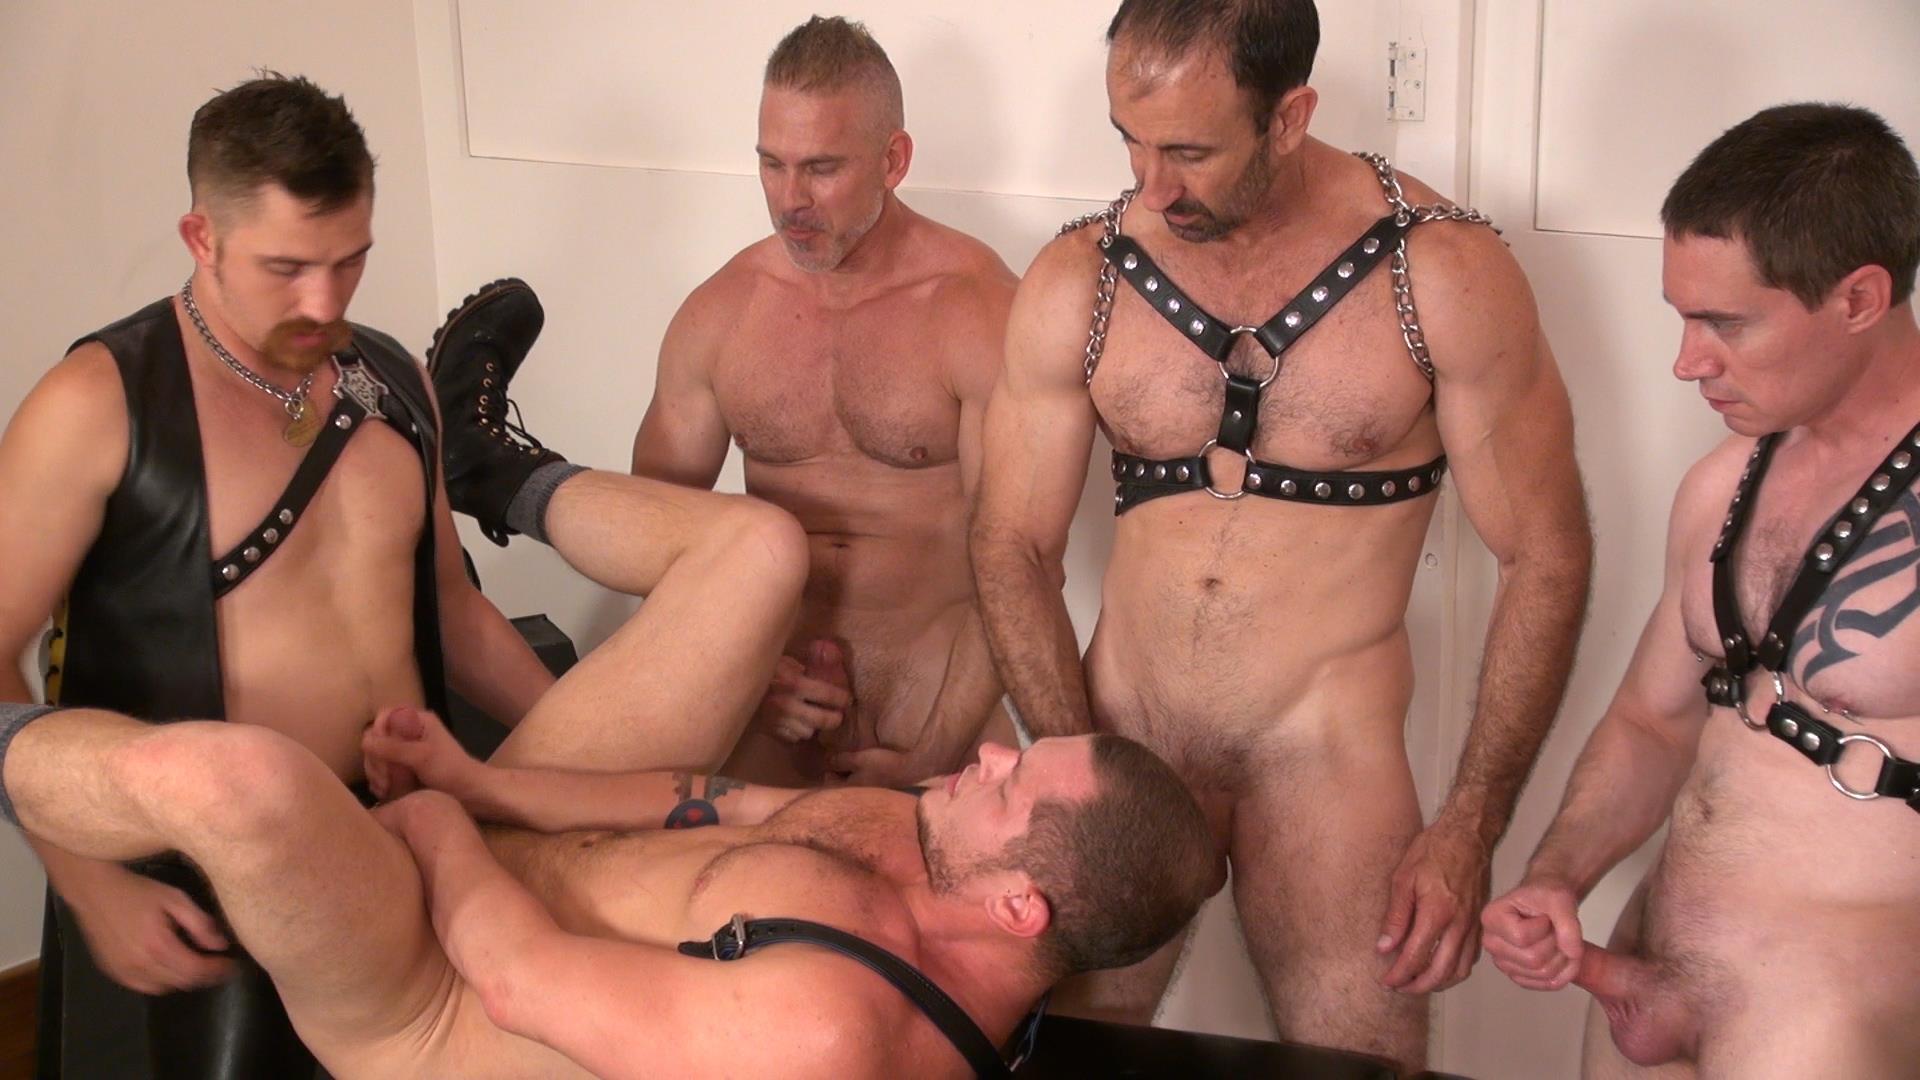 Raw-and-Rough-Jason-Mitchell-Steven-Richards-Sam-Dixon-Blue-Bailey-Dayton-OConnor-Jose-del-Toro-Bareback-Bathhouse-Amateur-Gay-Porn-10 Blue Bailey Getting Fucked Bareback By 5 Guys At A Bathhouse